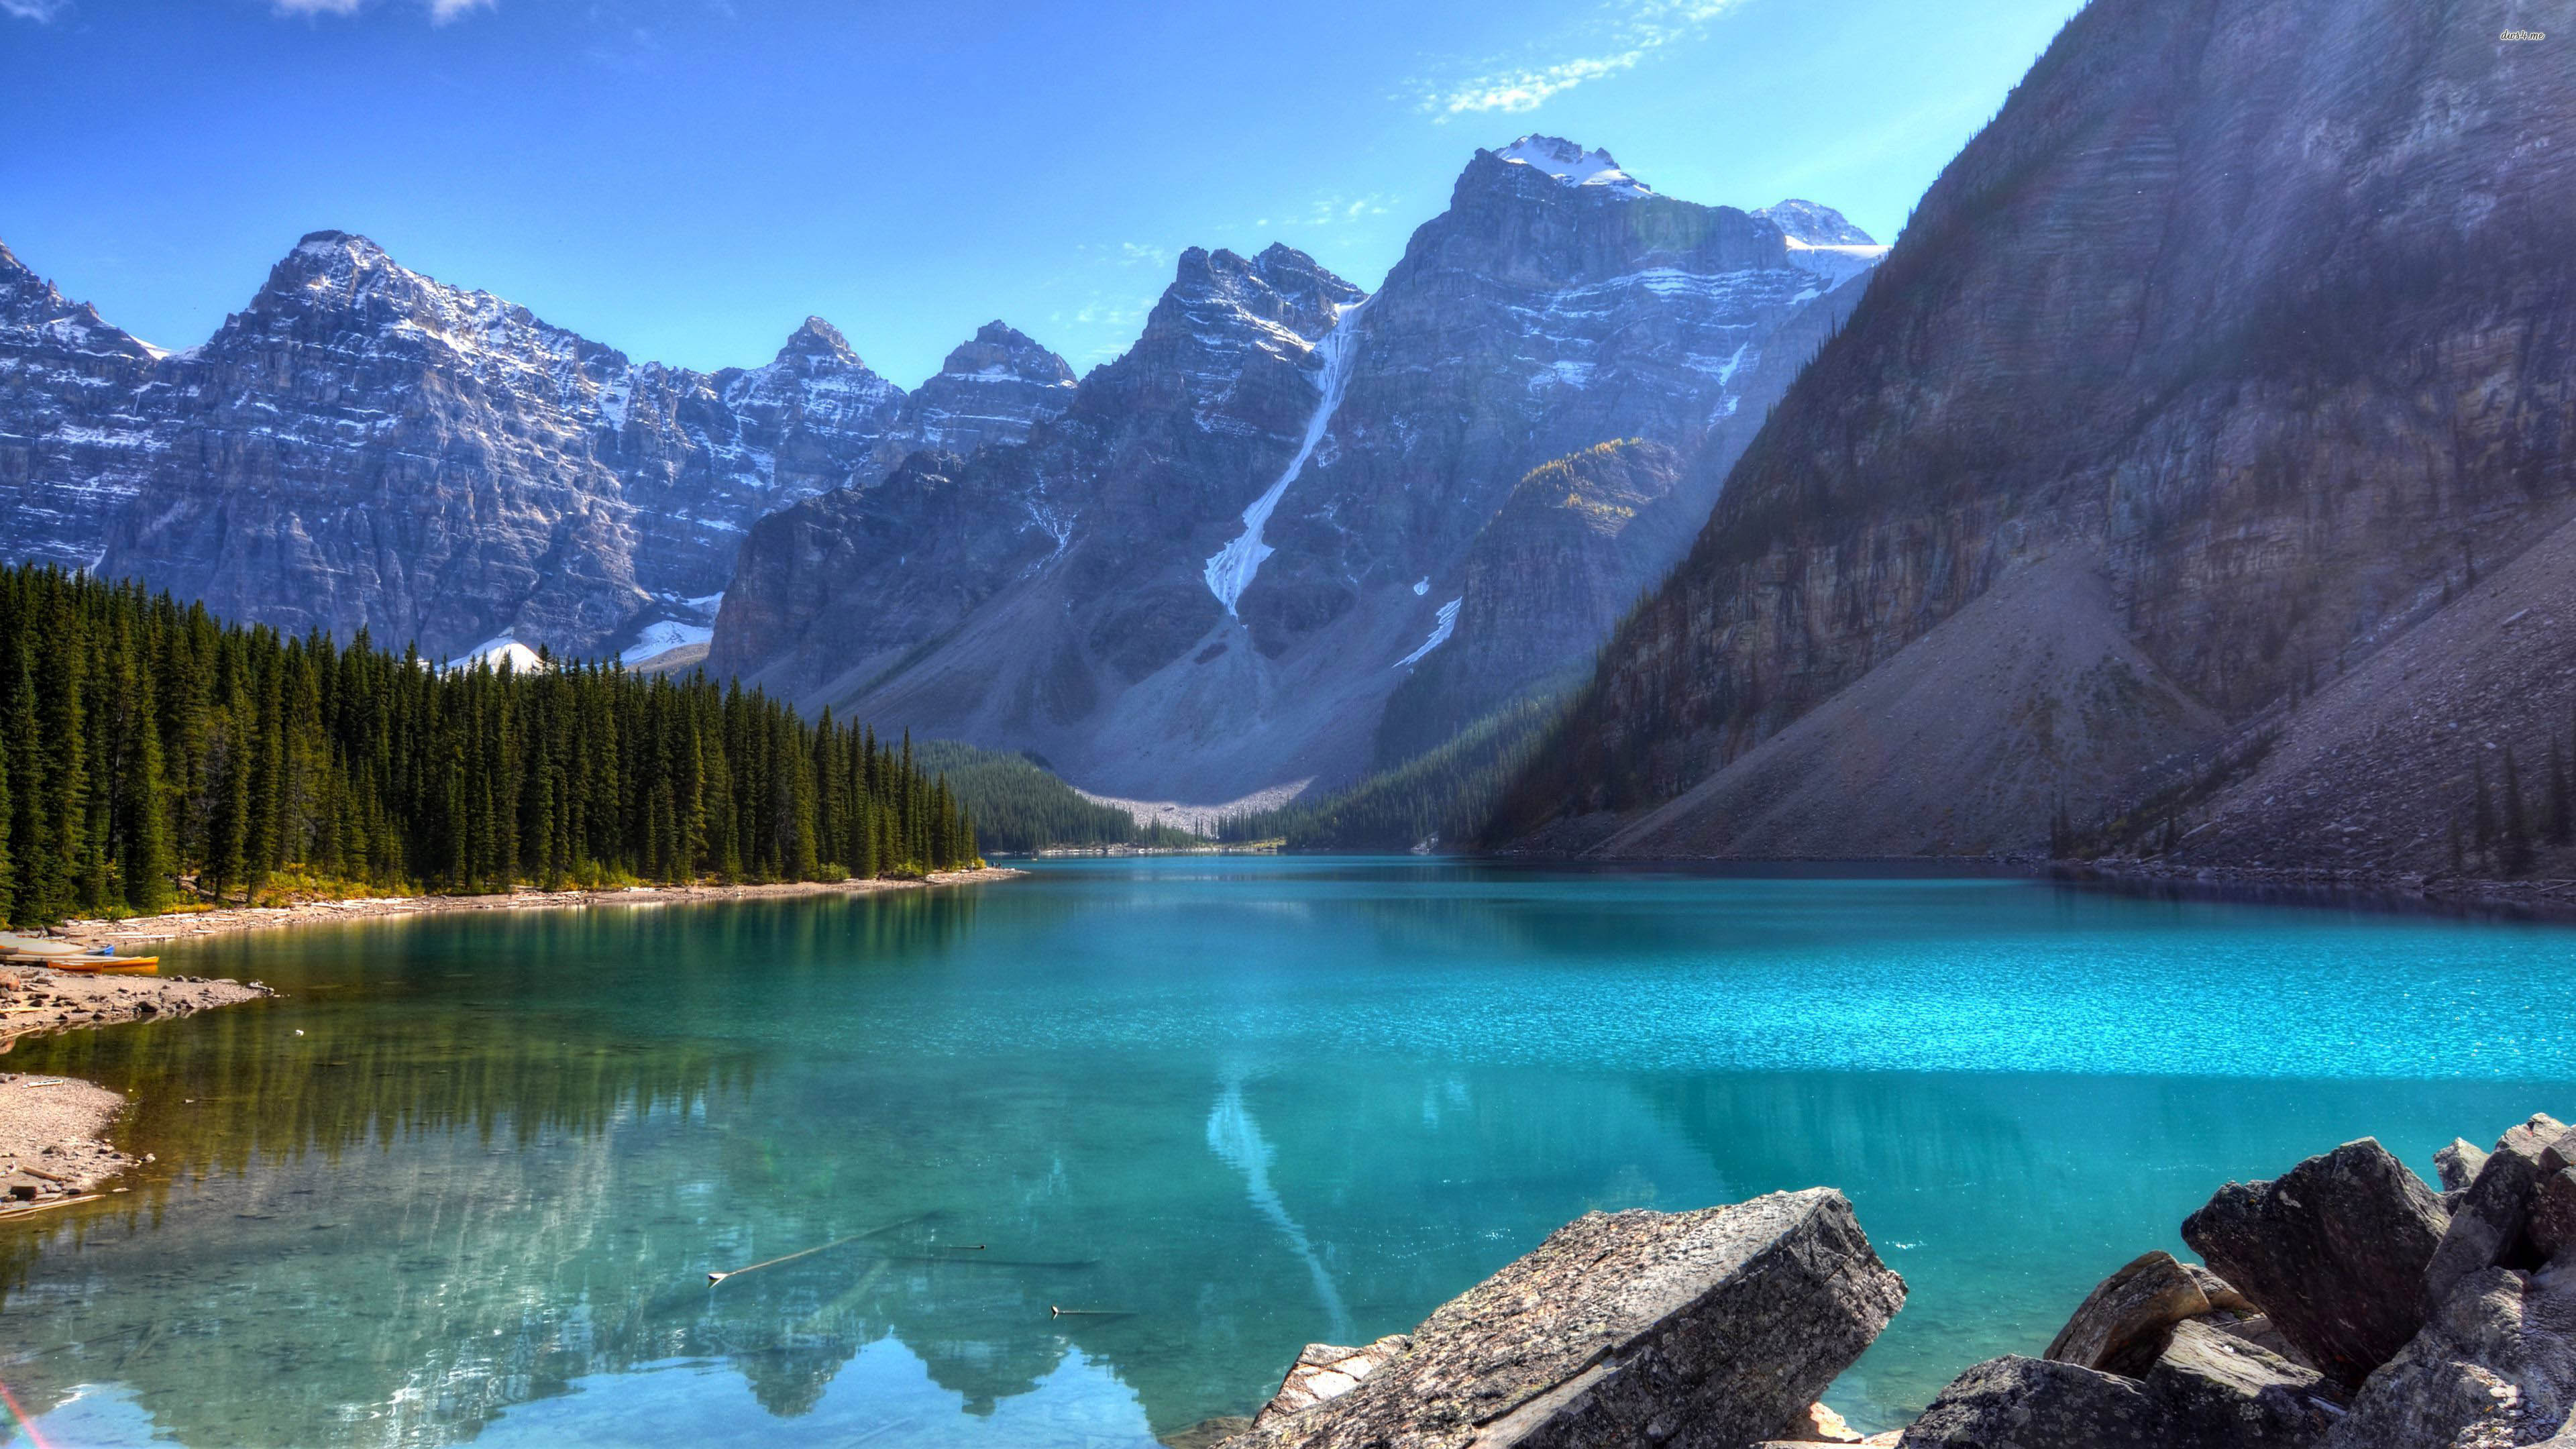 Beautiful Blue Mountain Lake 3840x2160 wallpaper 3840x2160